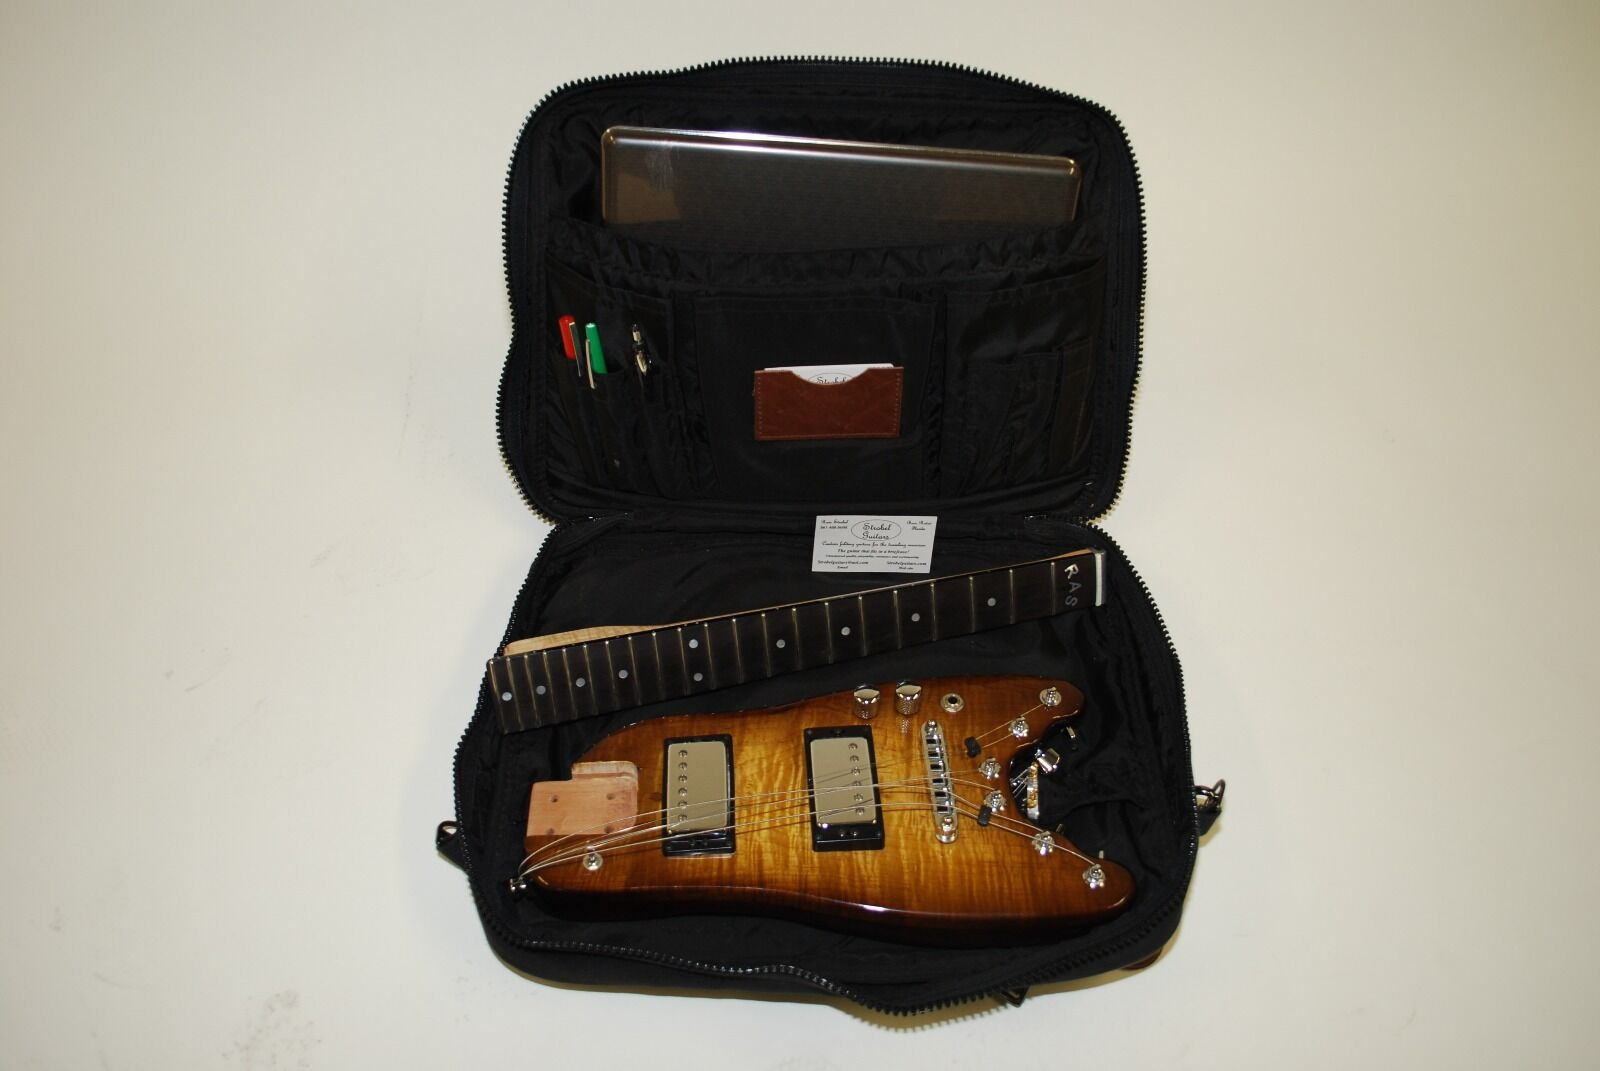 Strobel Rambler Professional Electric Travel Guitar (Tobacco Solburst)